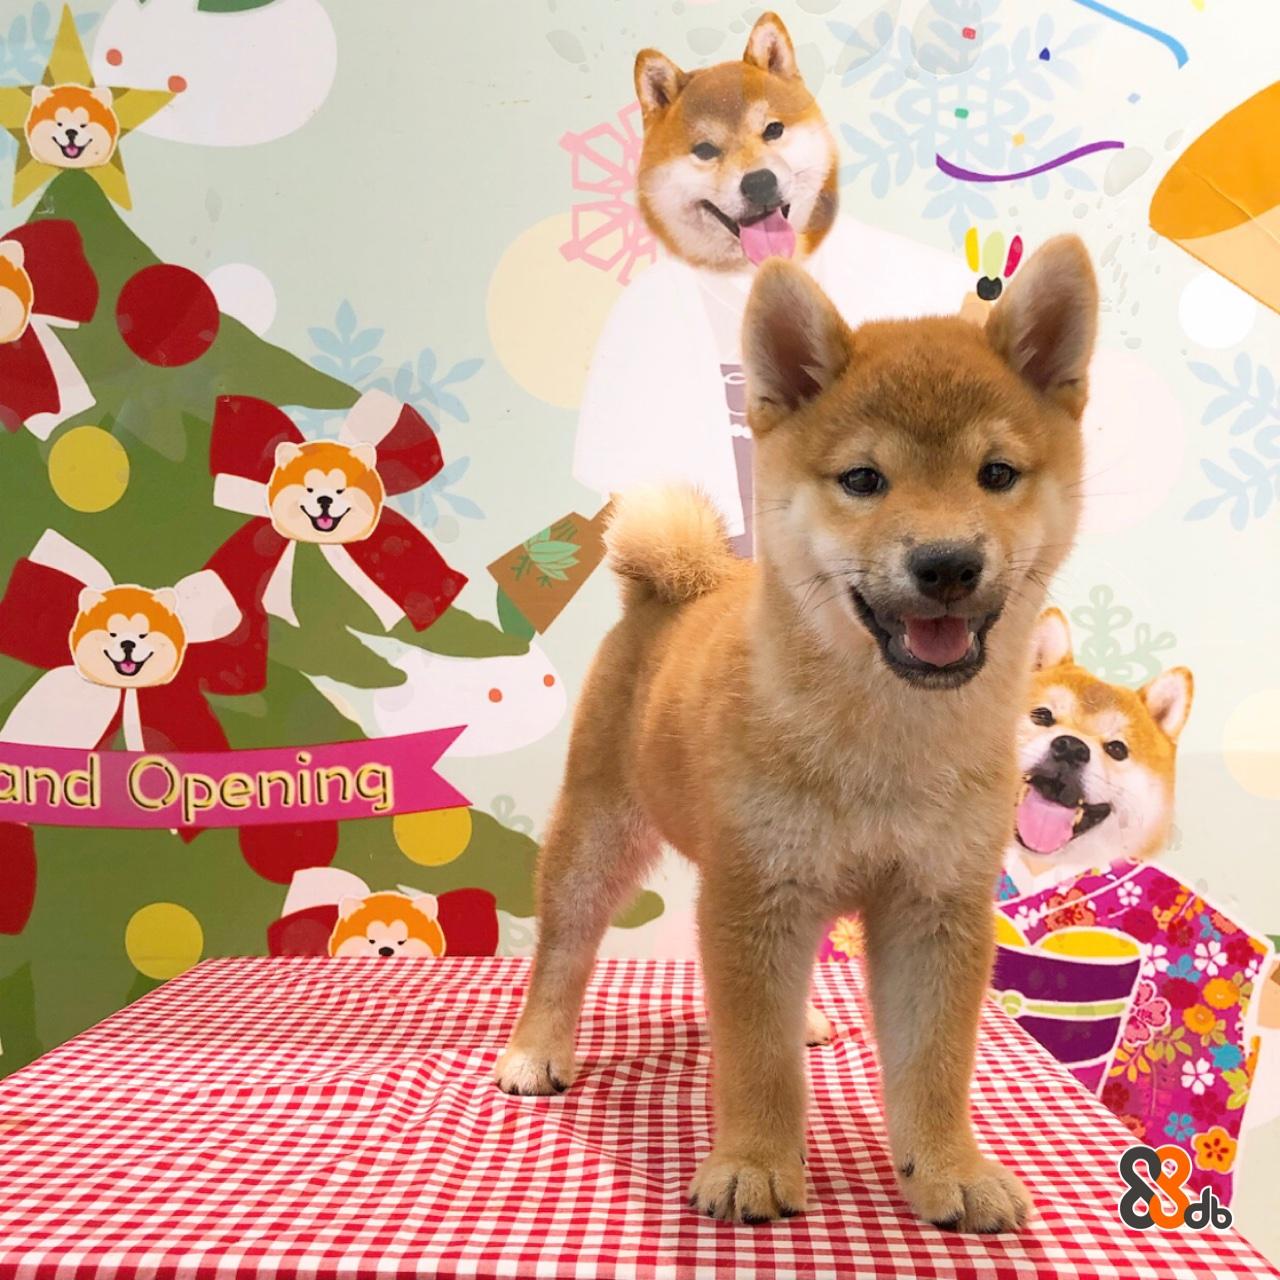 and Opening  dog,dog like mammal,dog breed,mammal,dog breed group